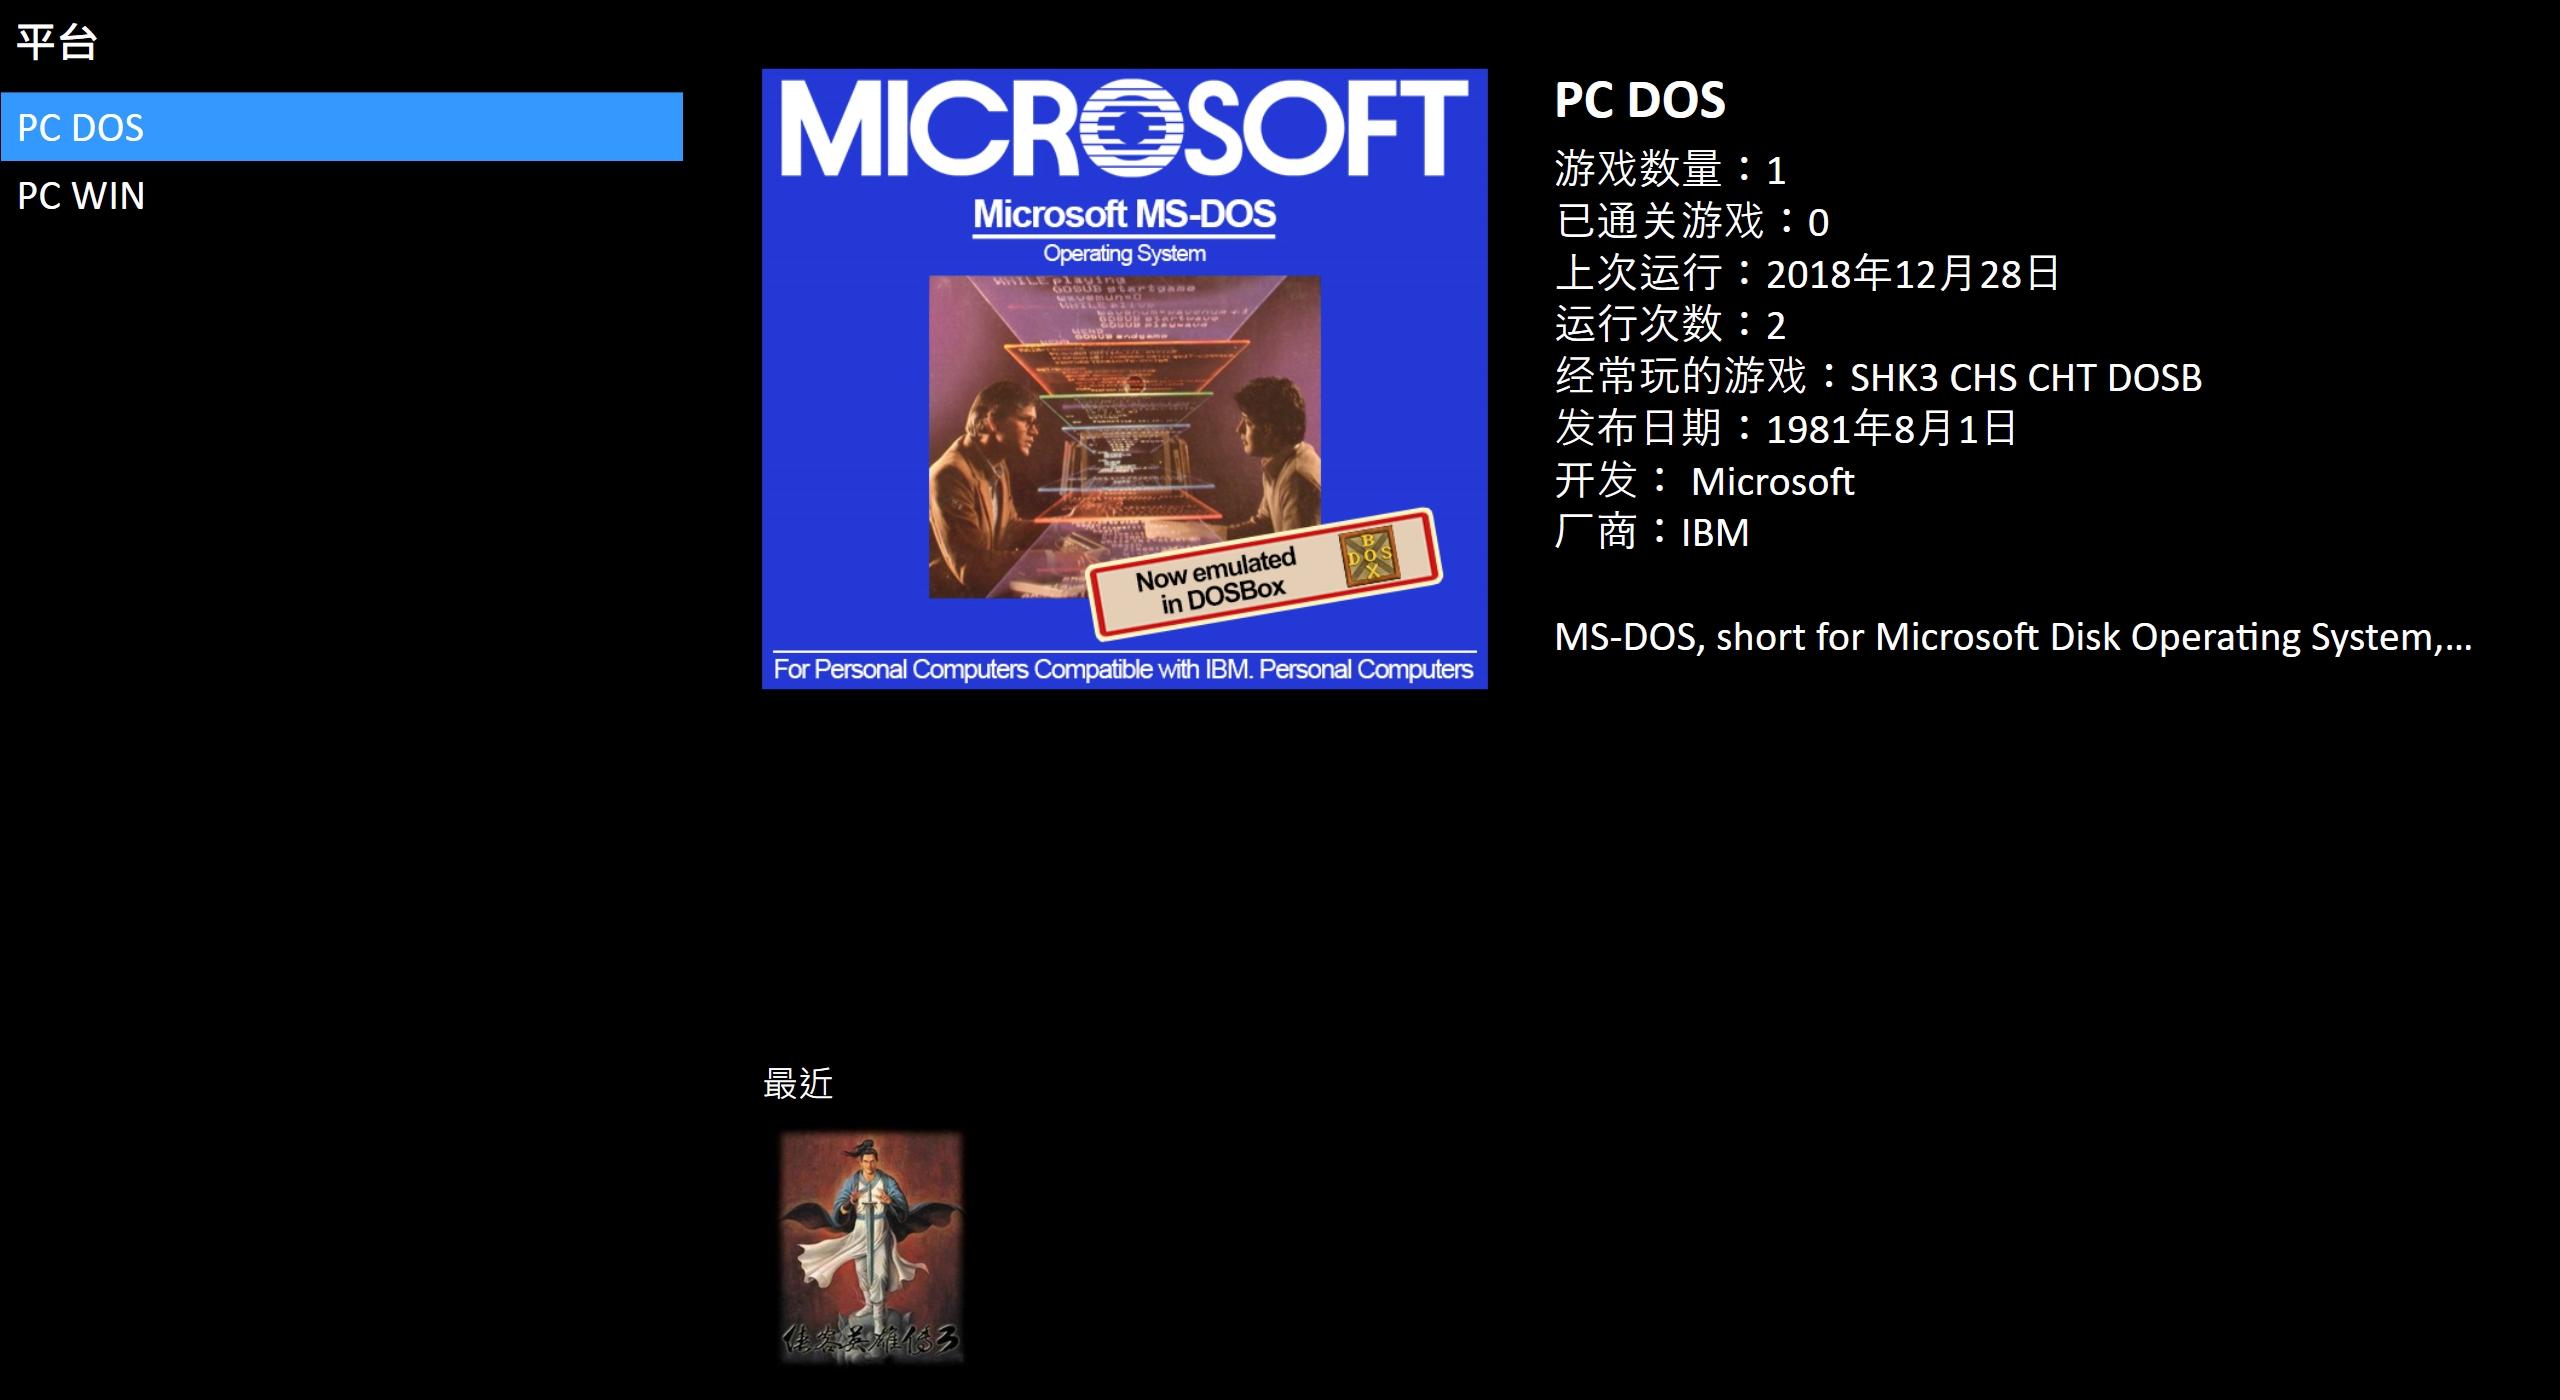 LaunchBox 經典13合1 啟動器整合 免安裝版 [MEGA@MD@20788MB]-Windows 遊戲下載-Windows 軟體交流-Android 臺灣中文網 - APK.TW